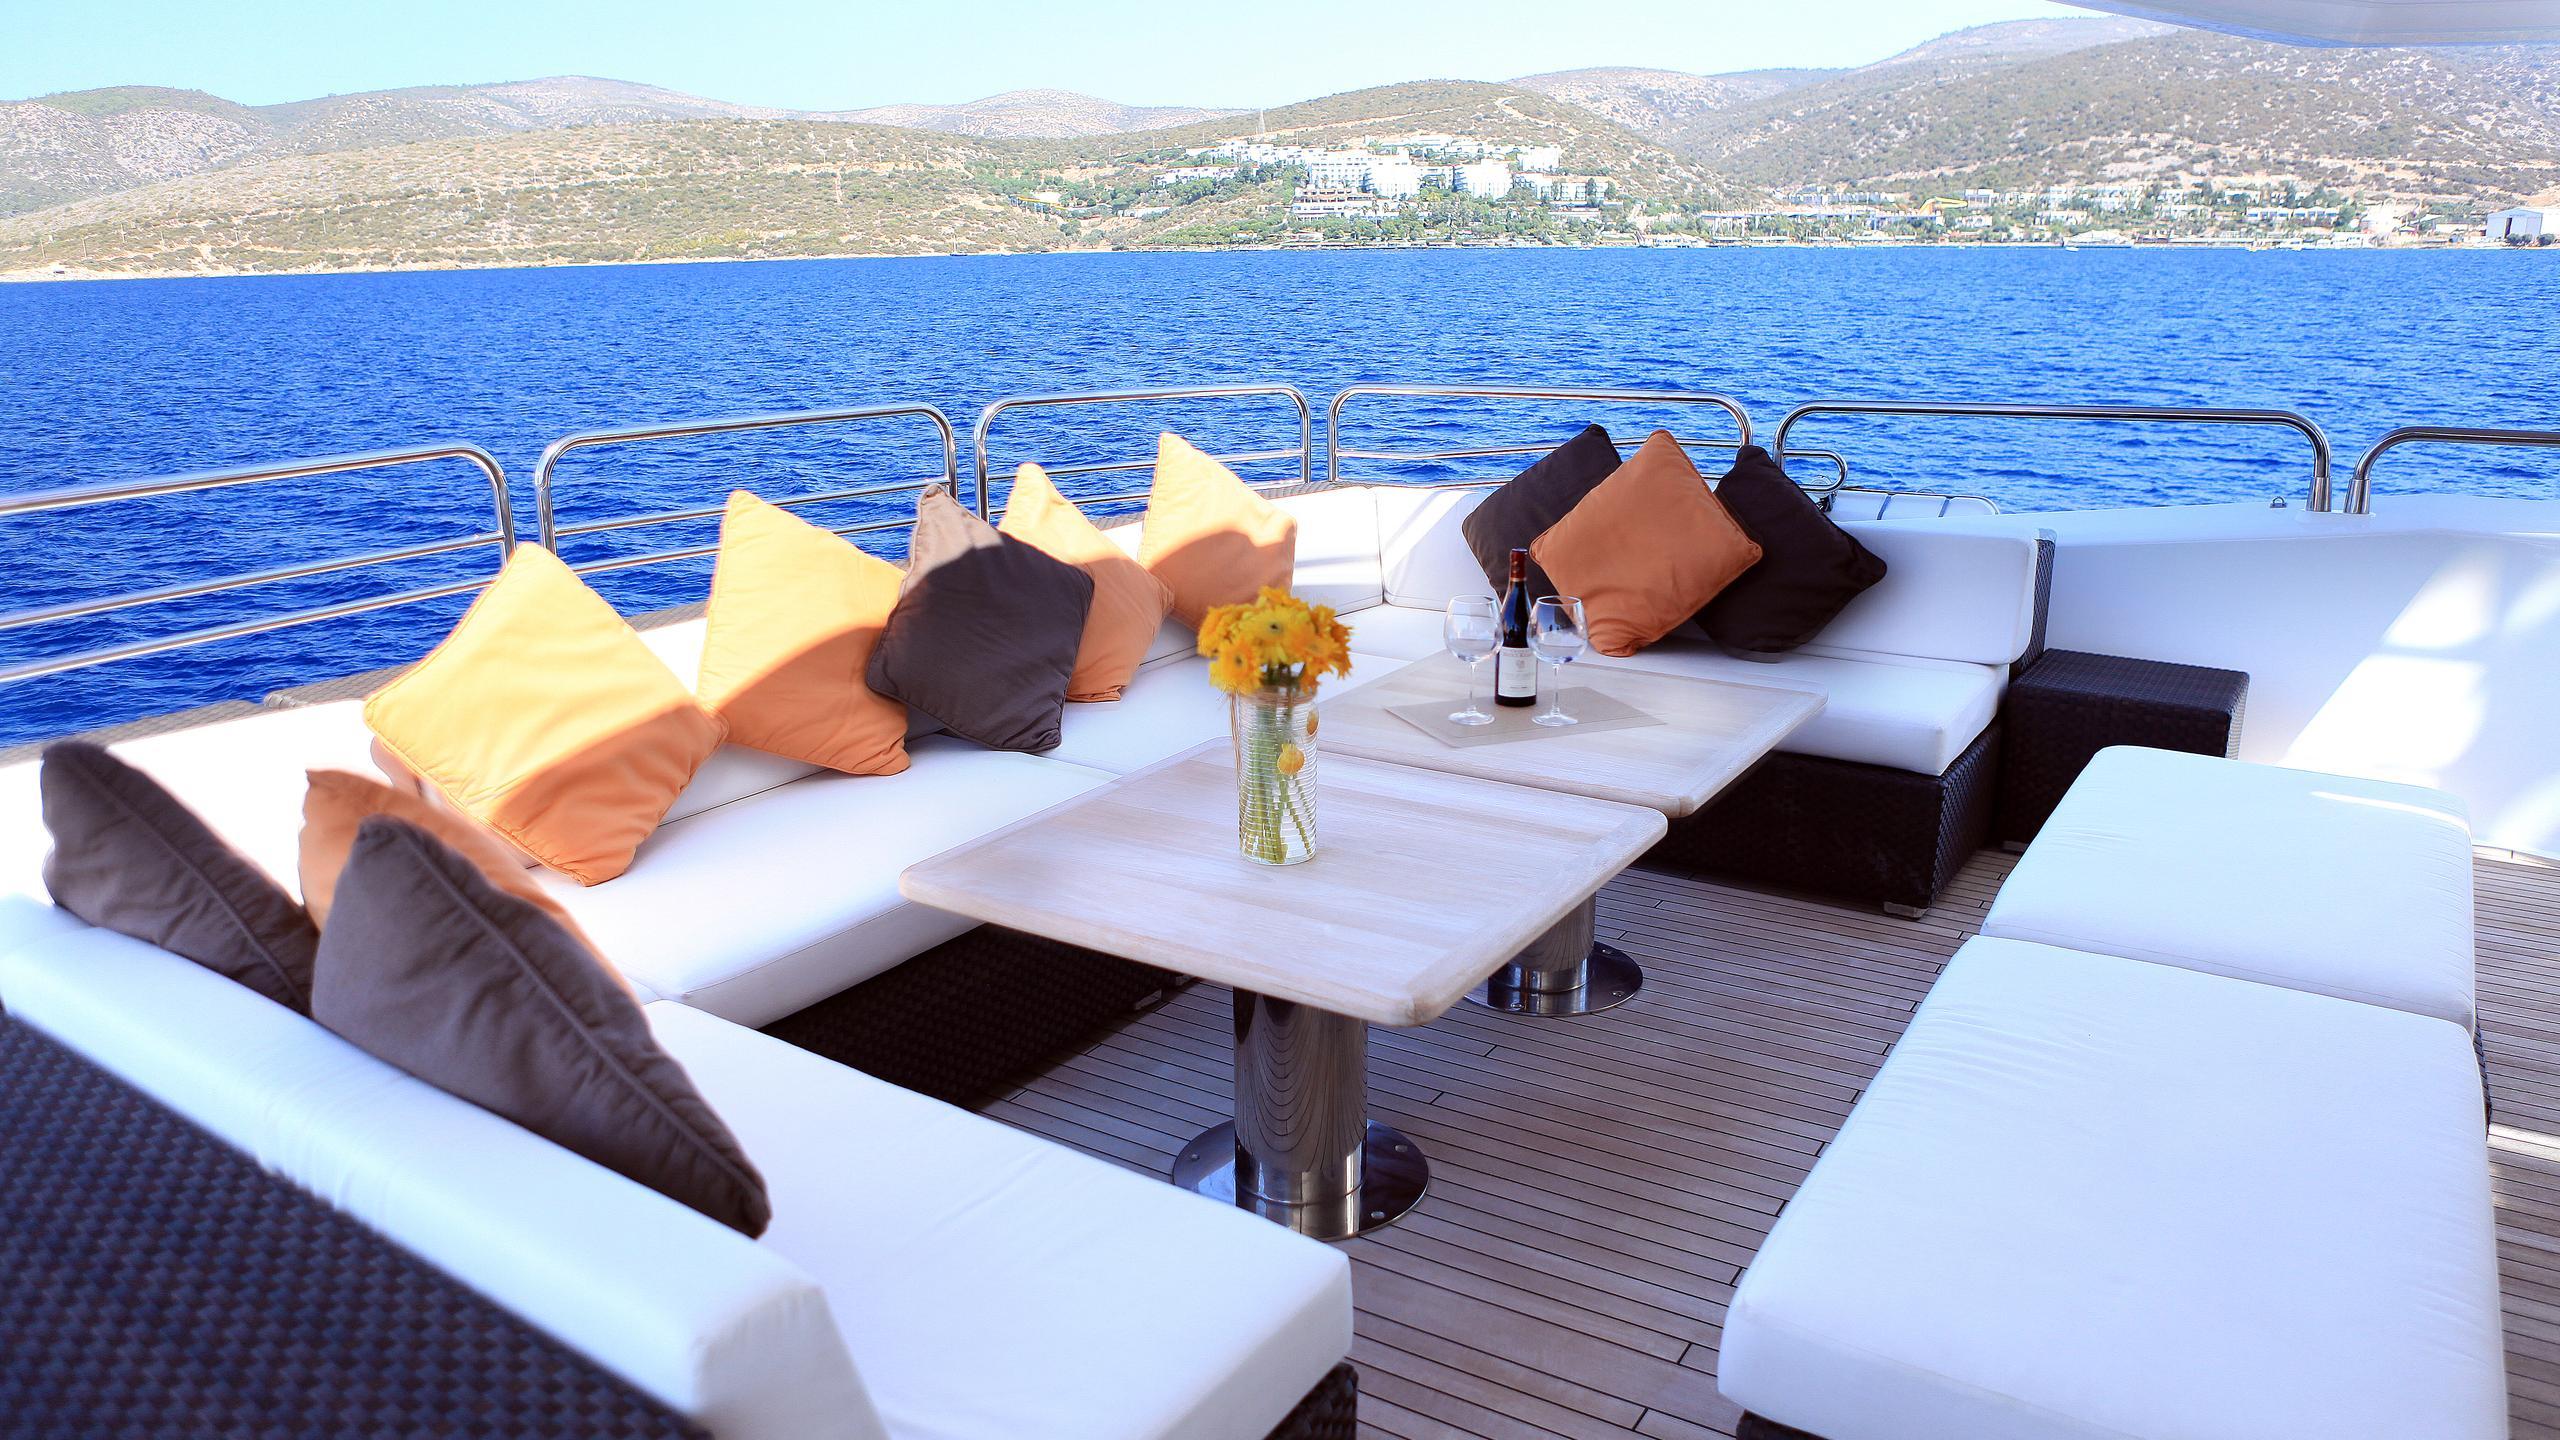 barracuda-red-sea-yacht-sun-lounger